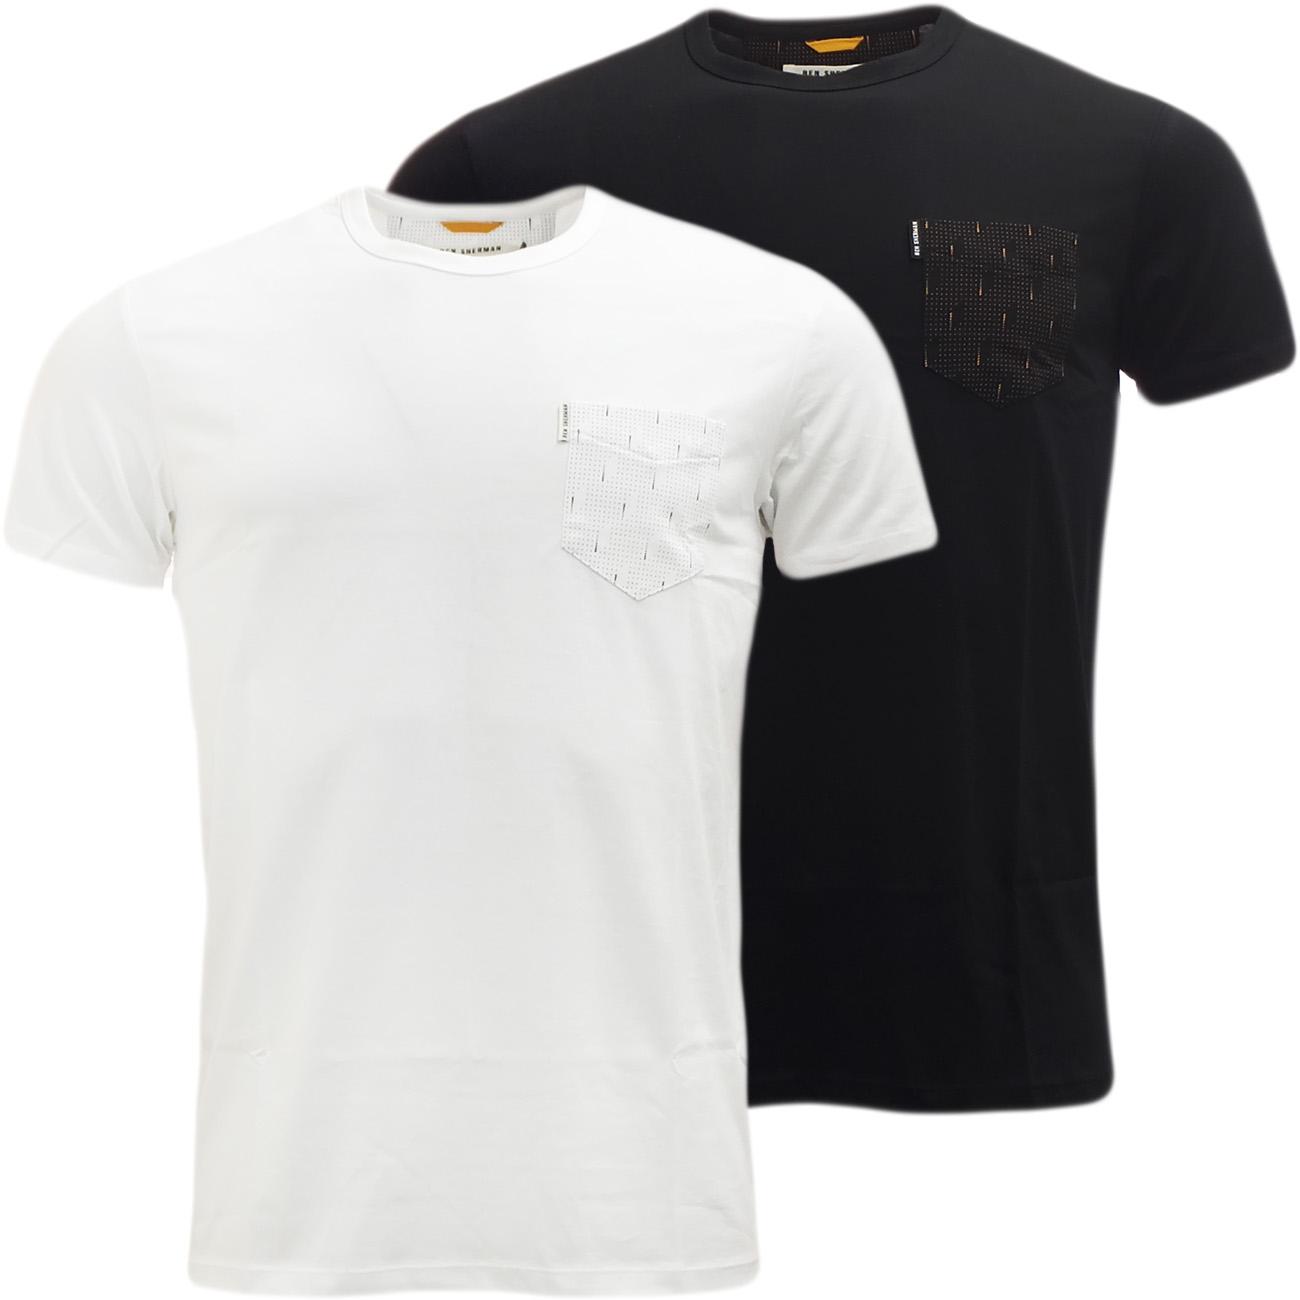 Ben Sherman Plain T Shirt